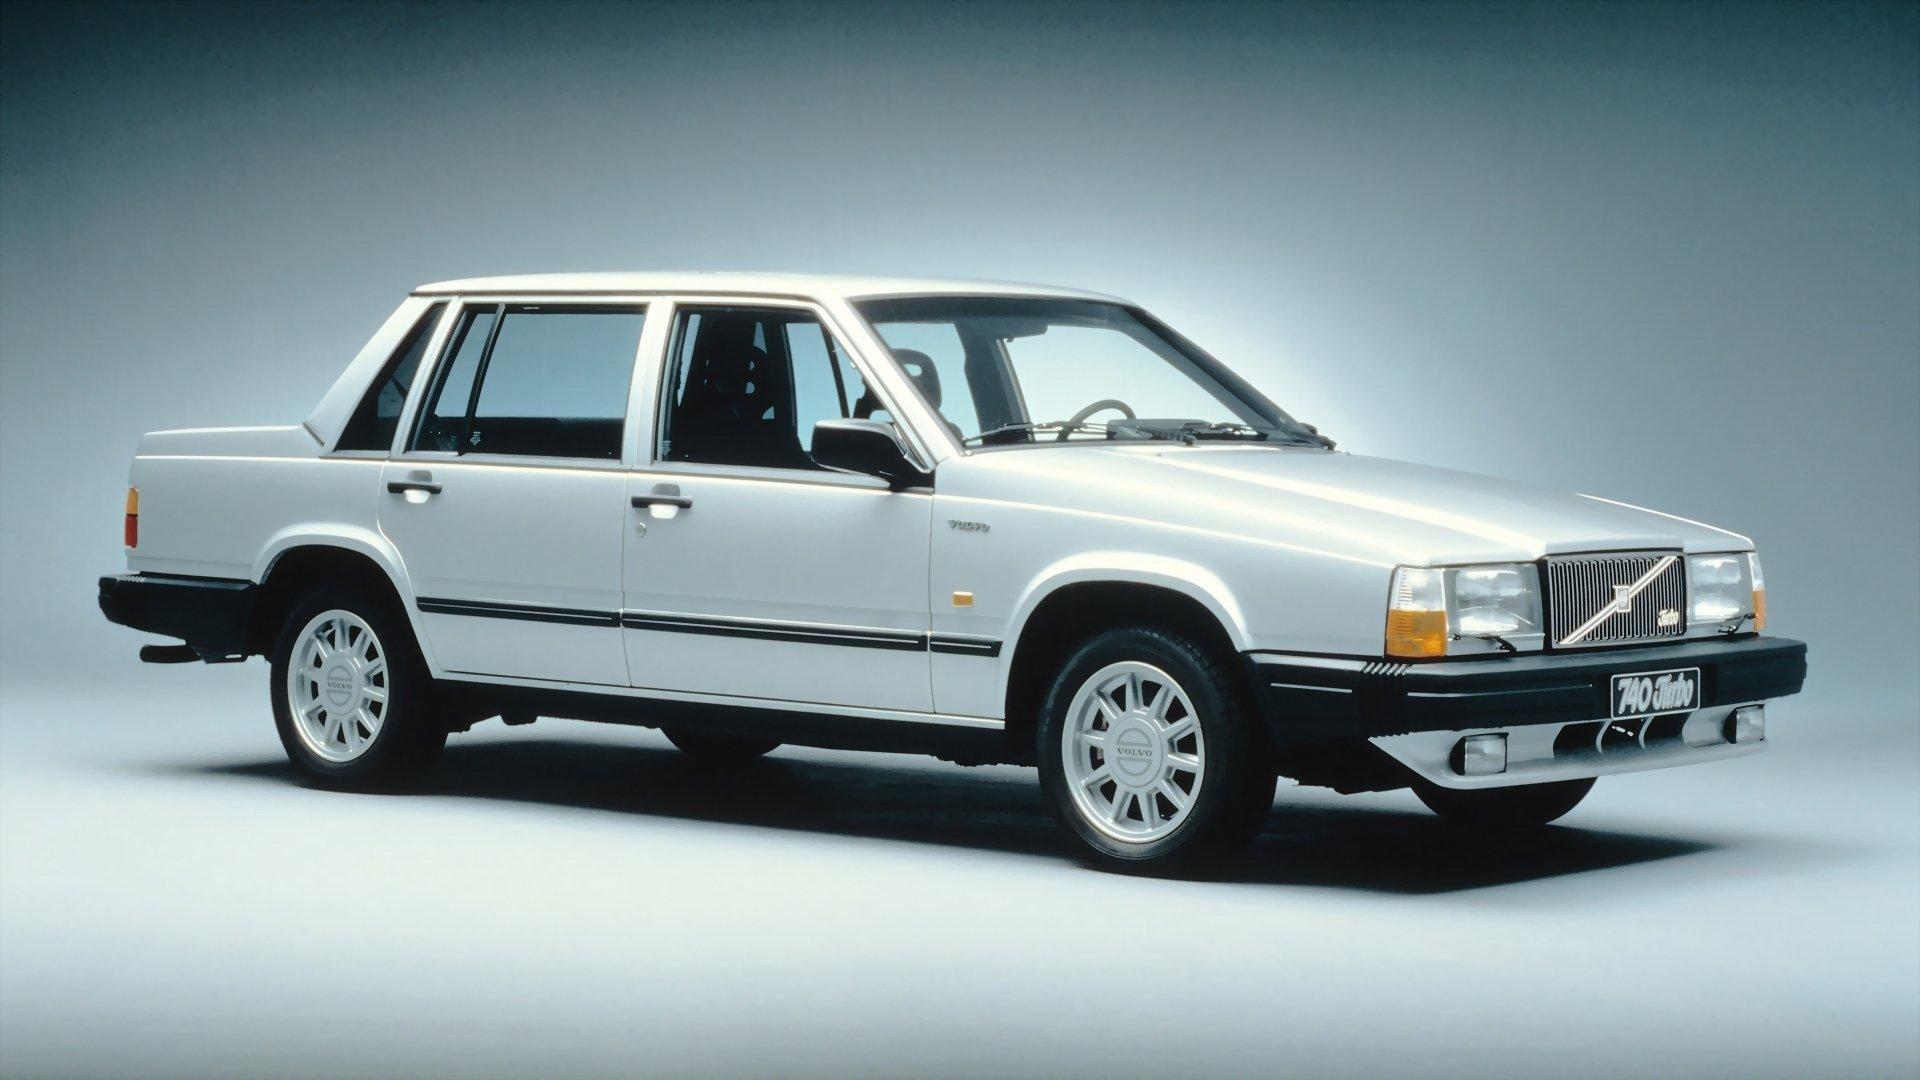 Vehicles - Volvo 700 Series  White Car Sedan Wallpaper